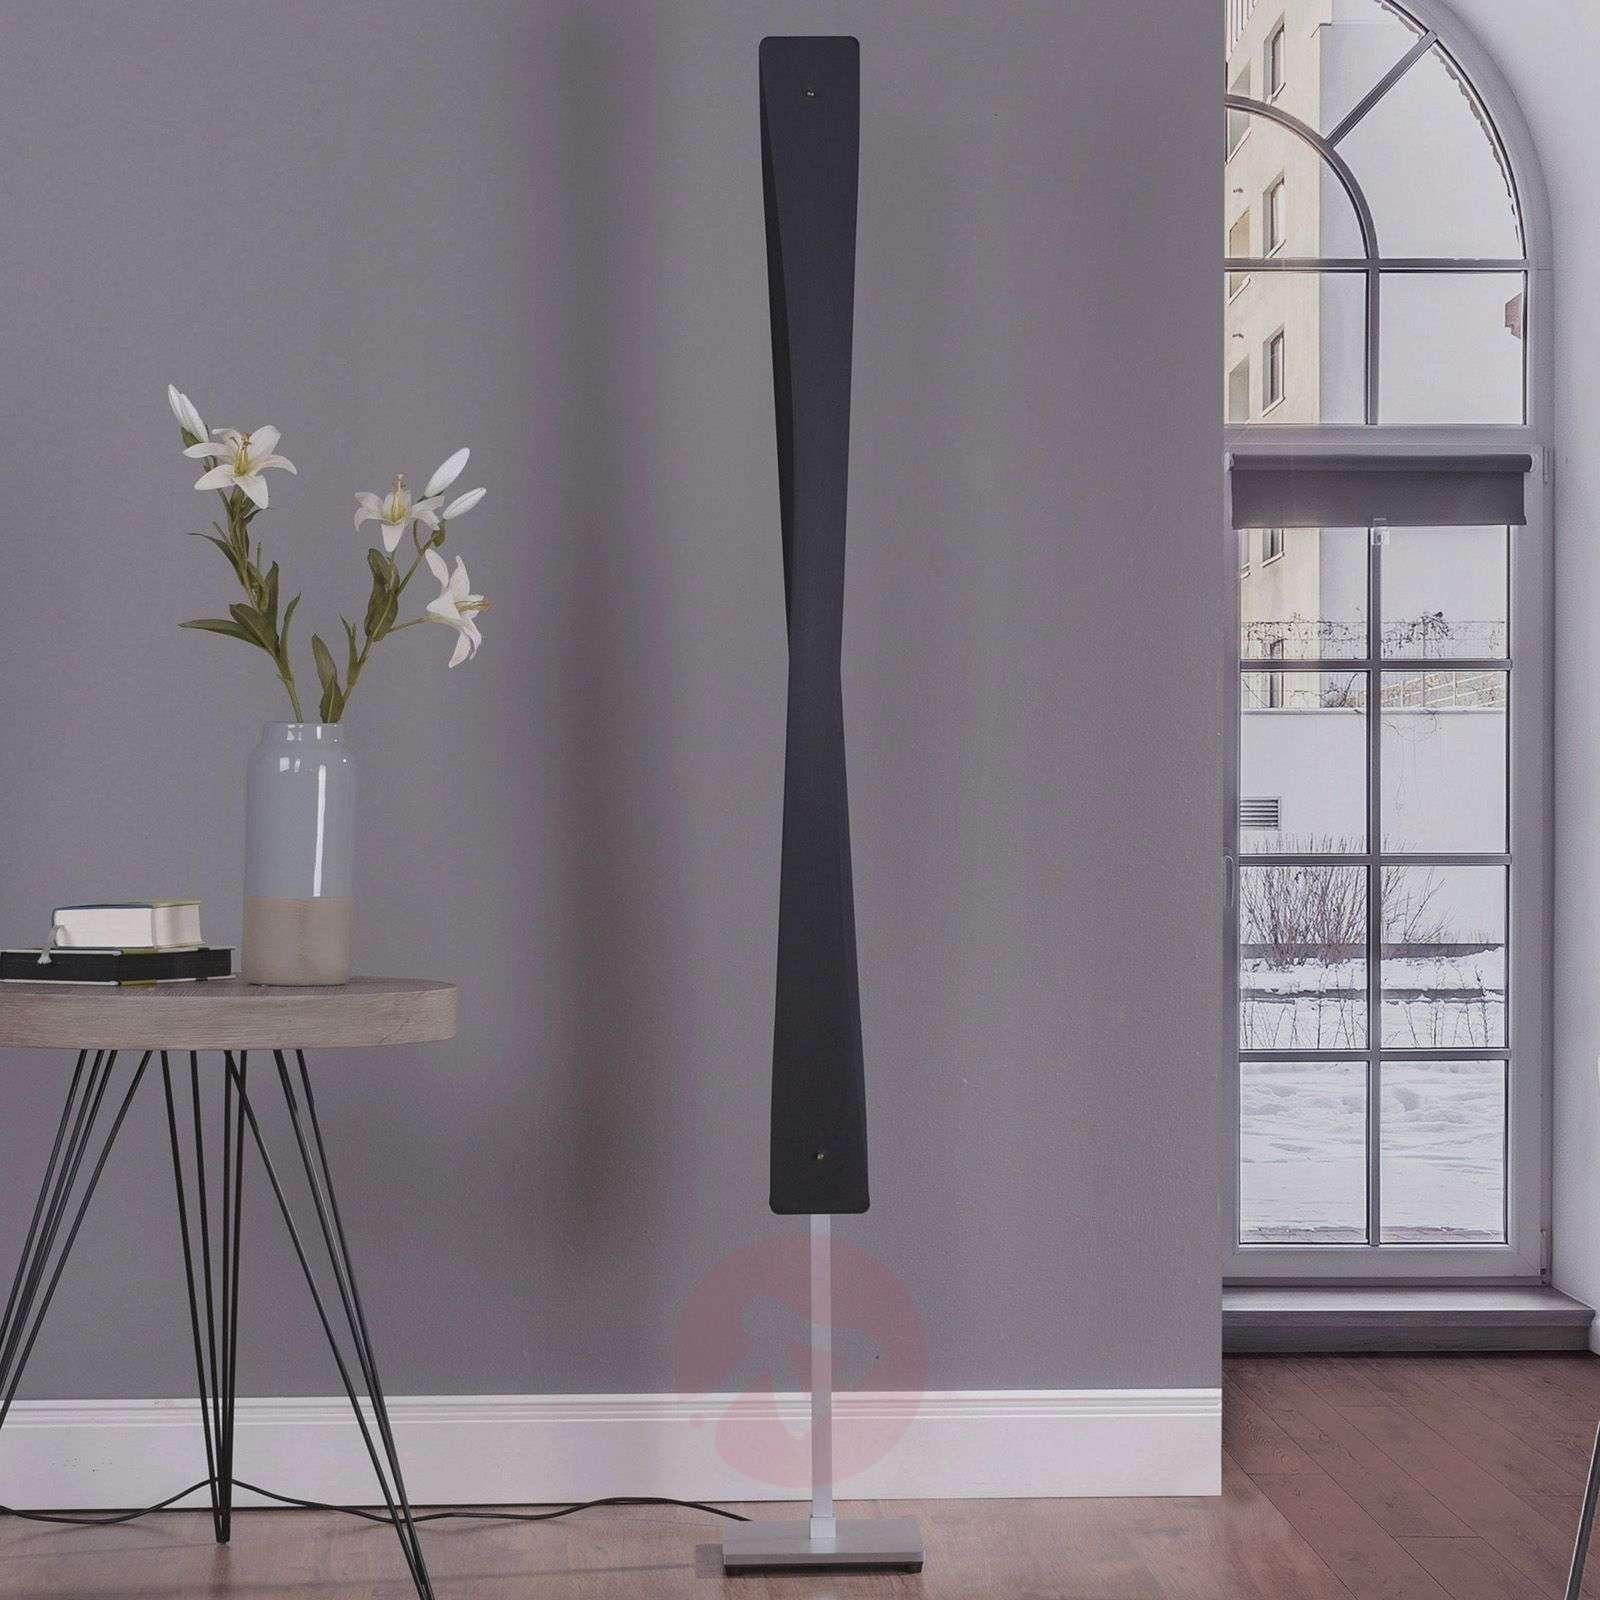 Lucande Lian LED-lattiavalaisin, musta, alumiini-6722551-01